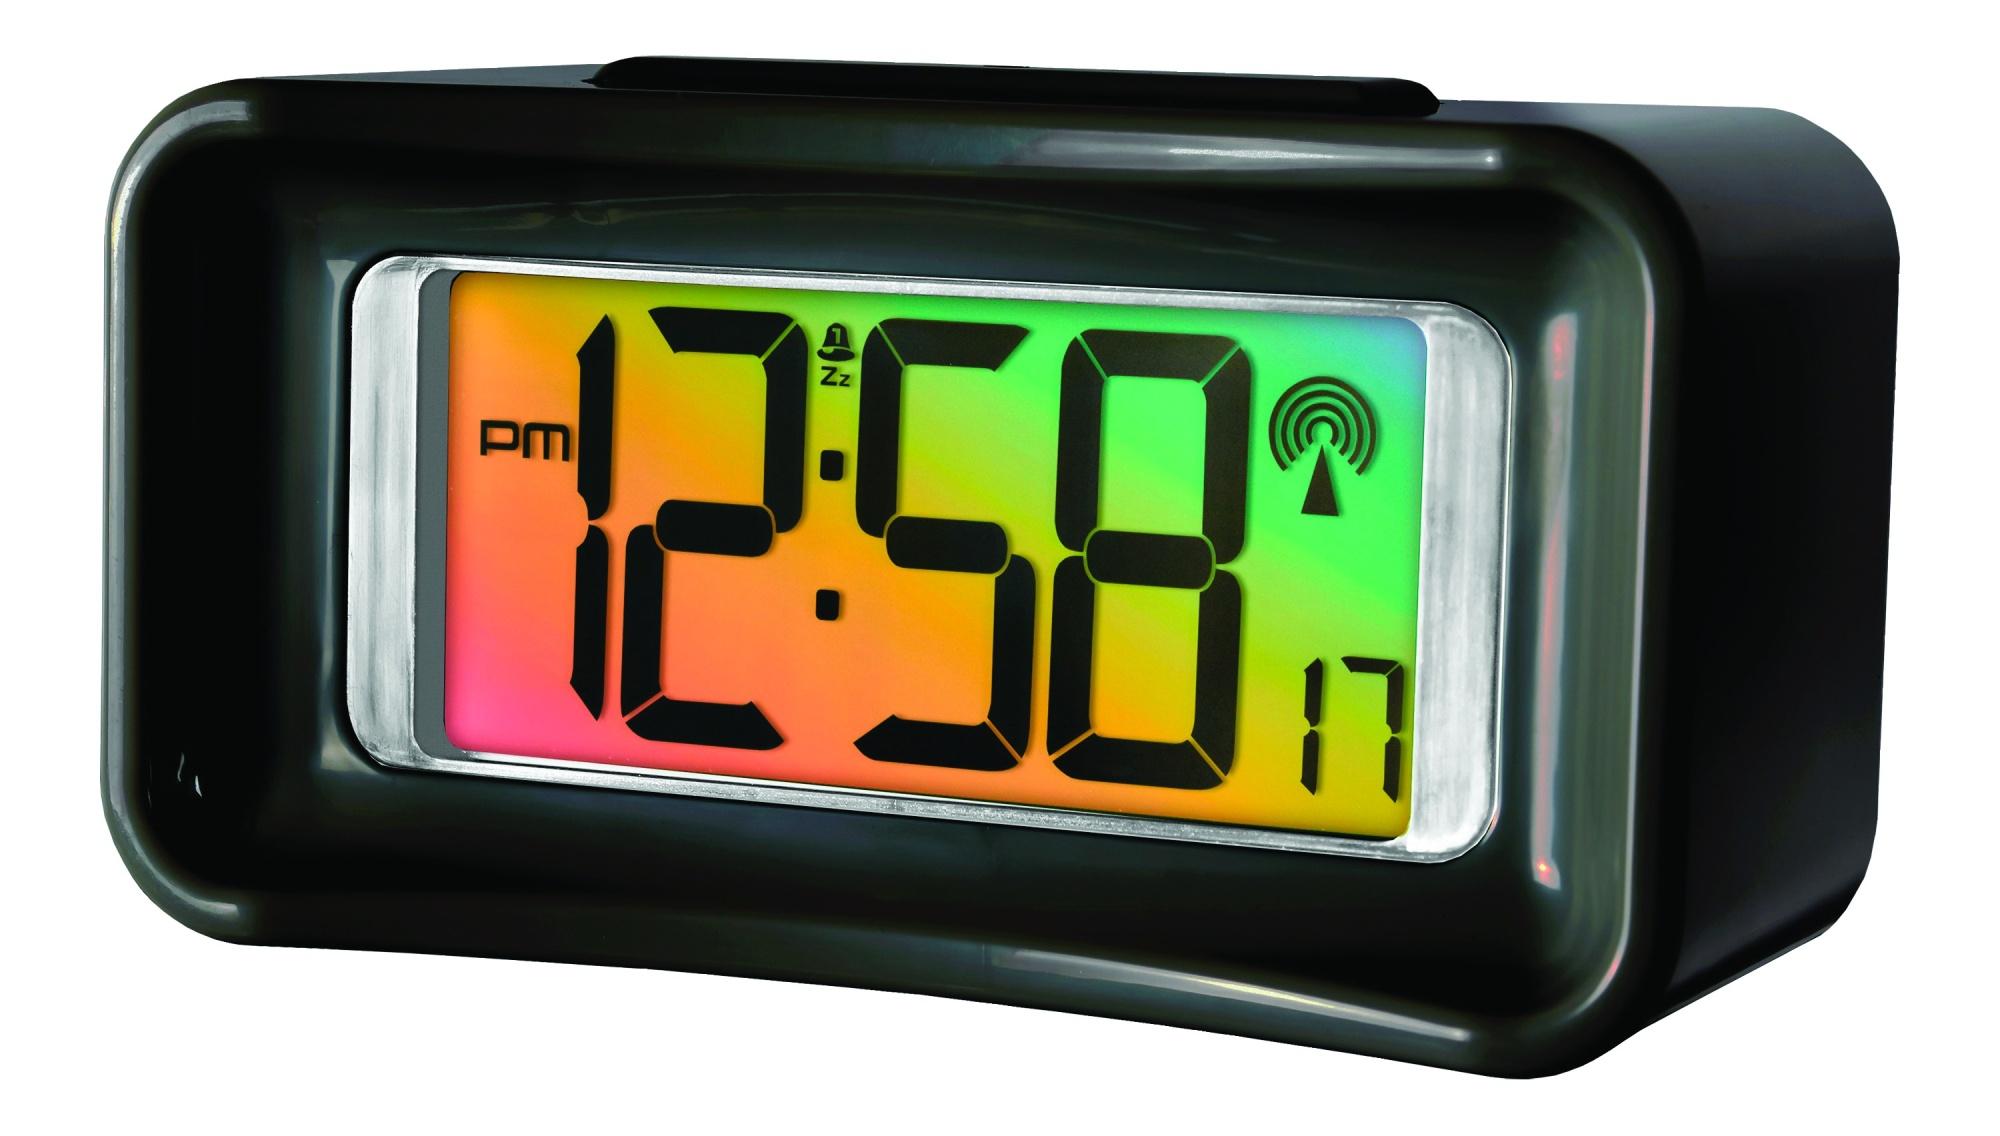 acctim guardia radio controlled alarm clock black ebay. Black Bedroom Furniture Sets. Home Design Ideas